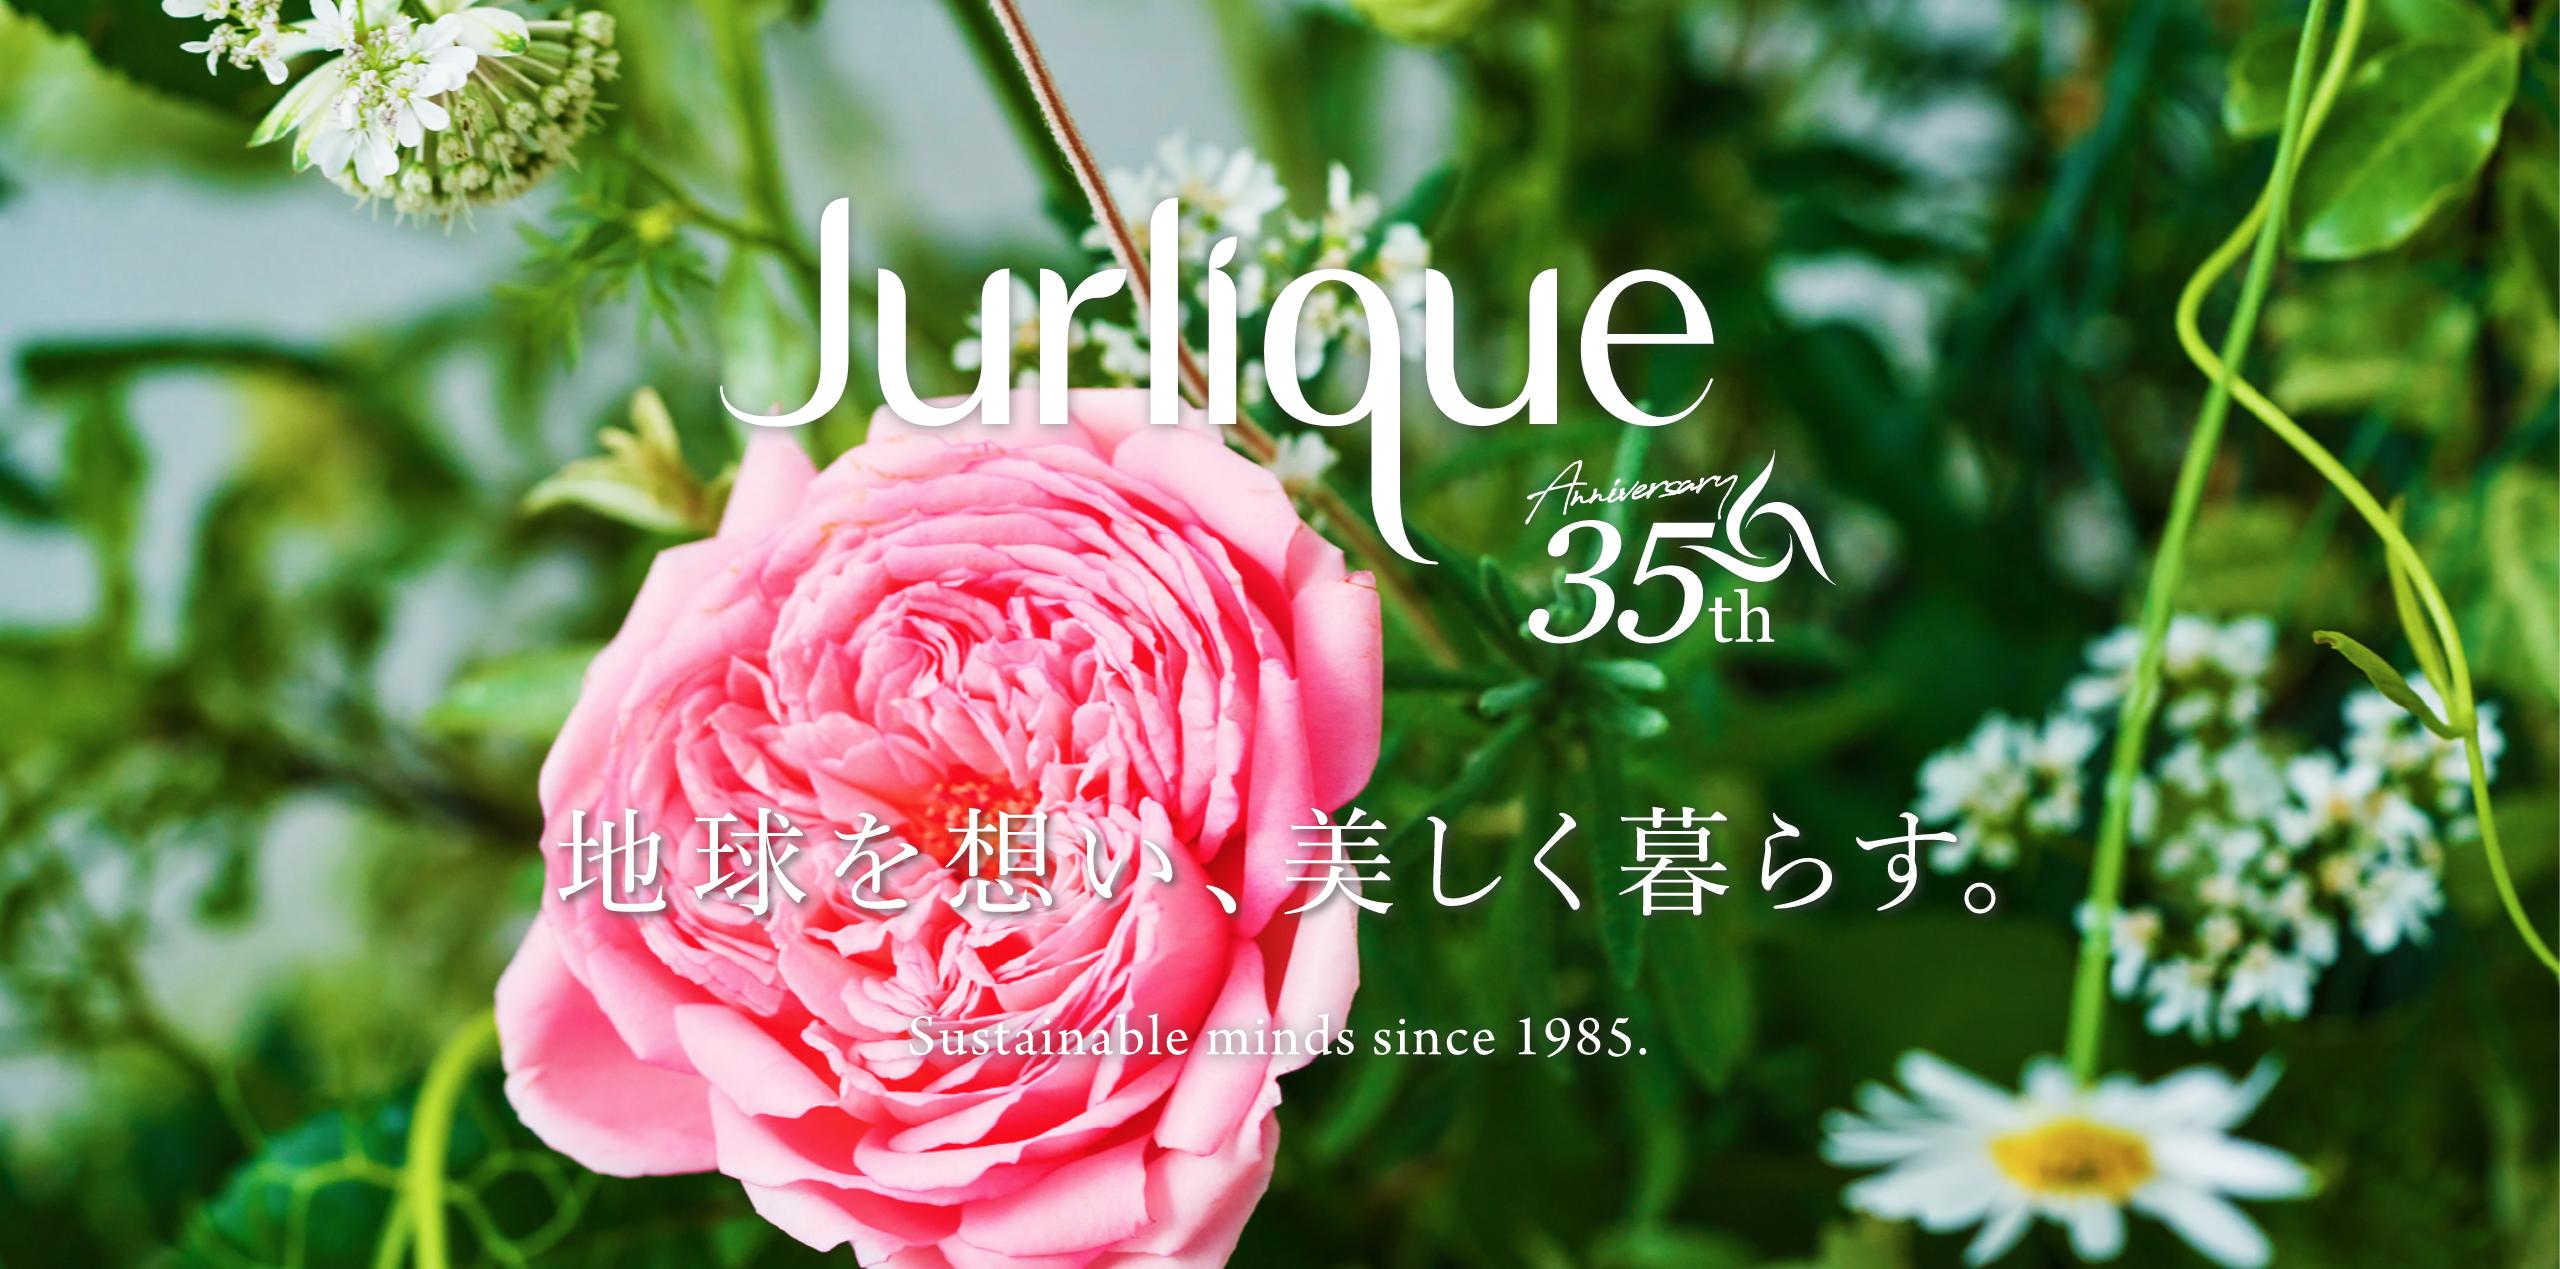 Jurlique35th特設サイト